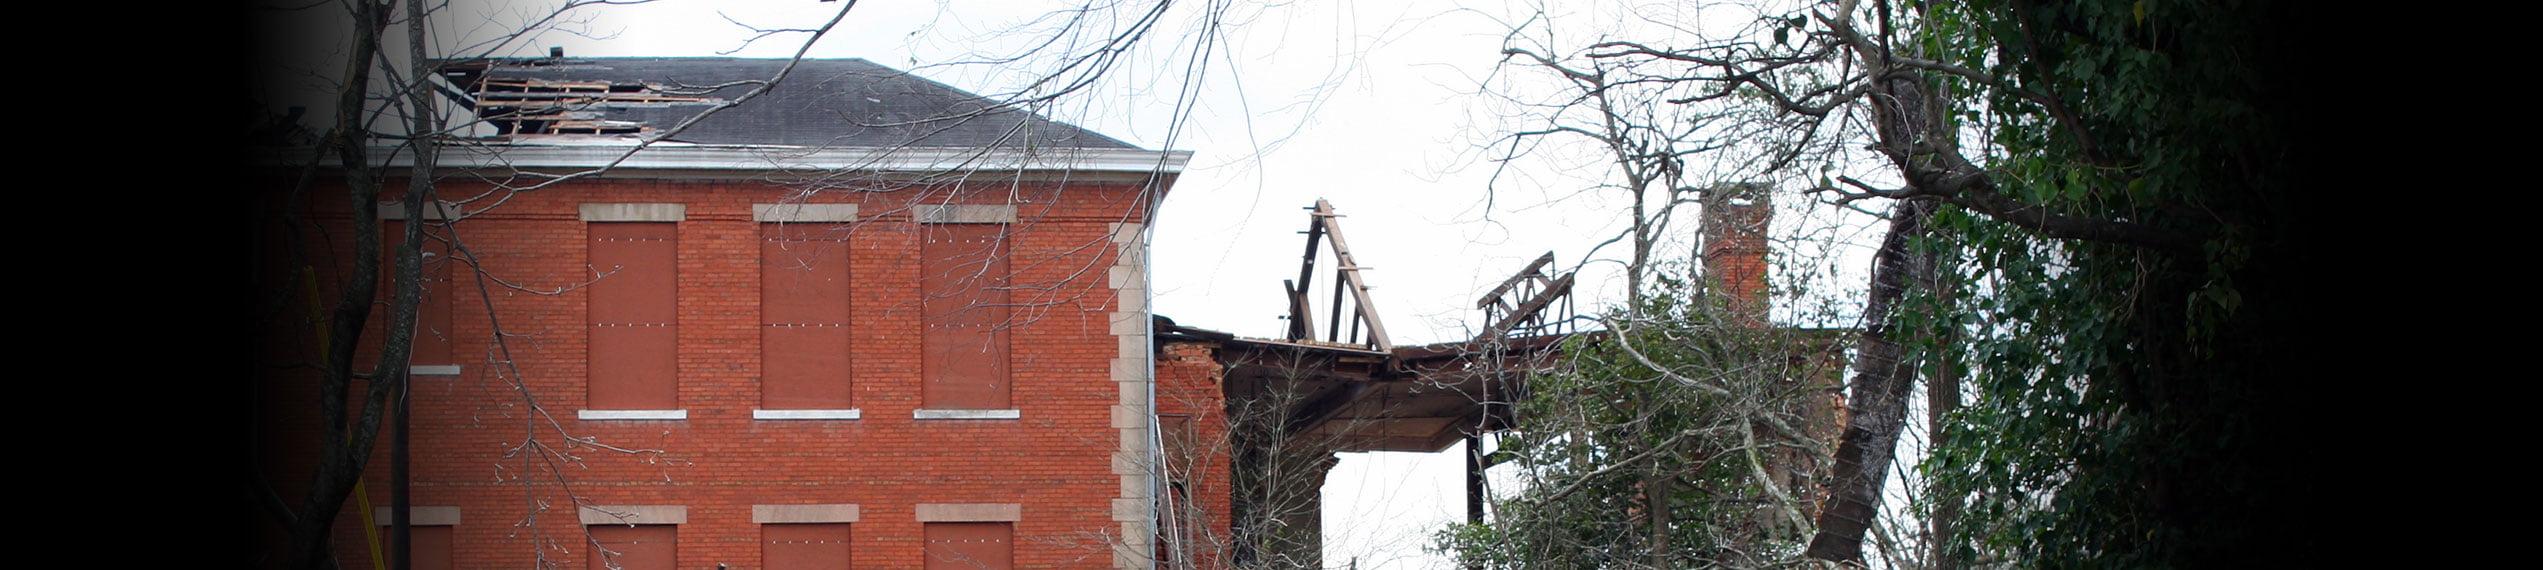 Wind & Storm Damage Repairs in Paul Davis Restoration & Remodeling of Greater Charleston